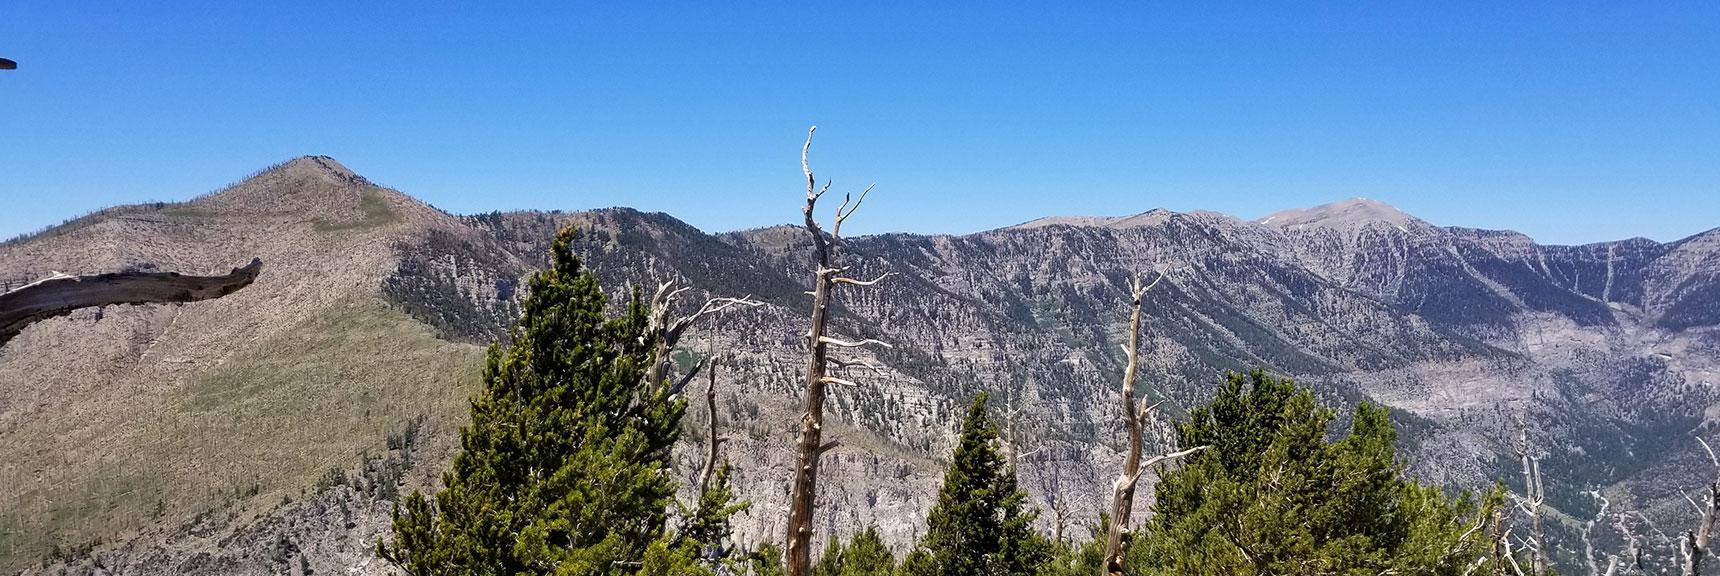 Griffith Peak to Charleston Peak Viewed from Harris Mountain, Nevada